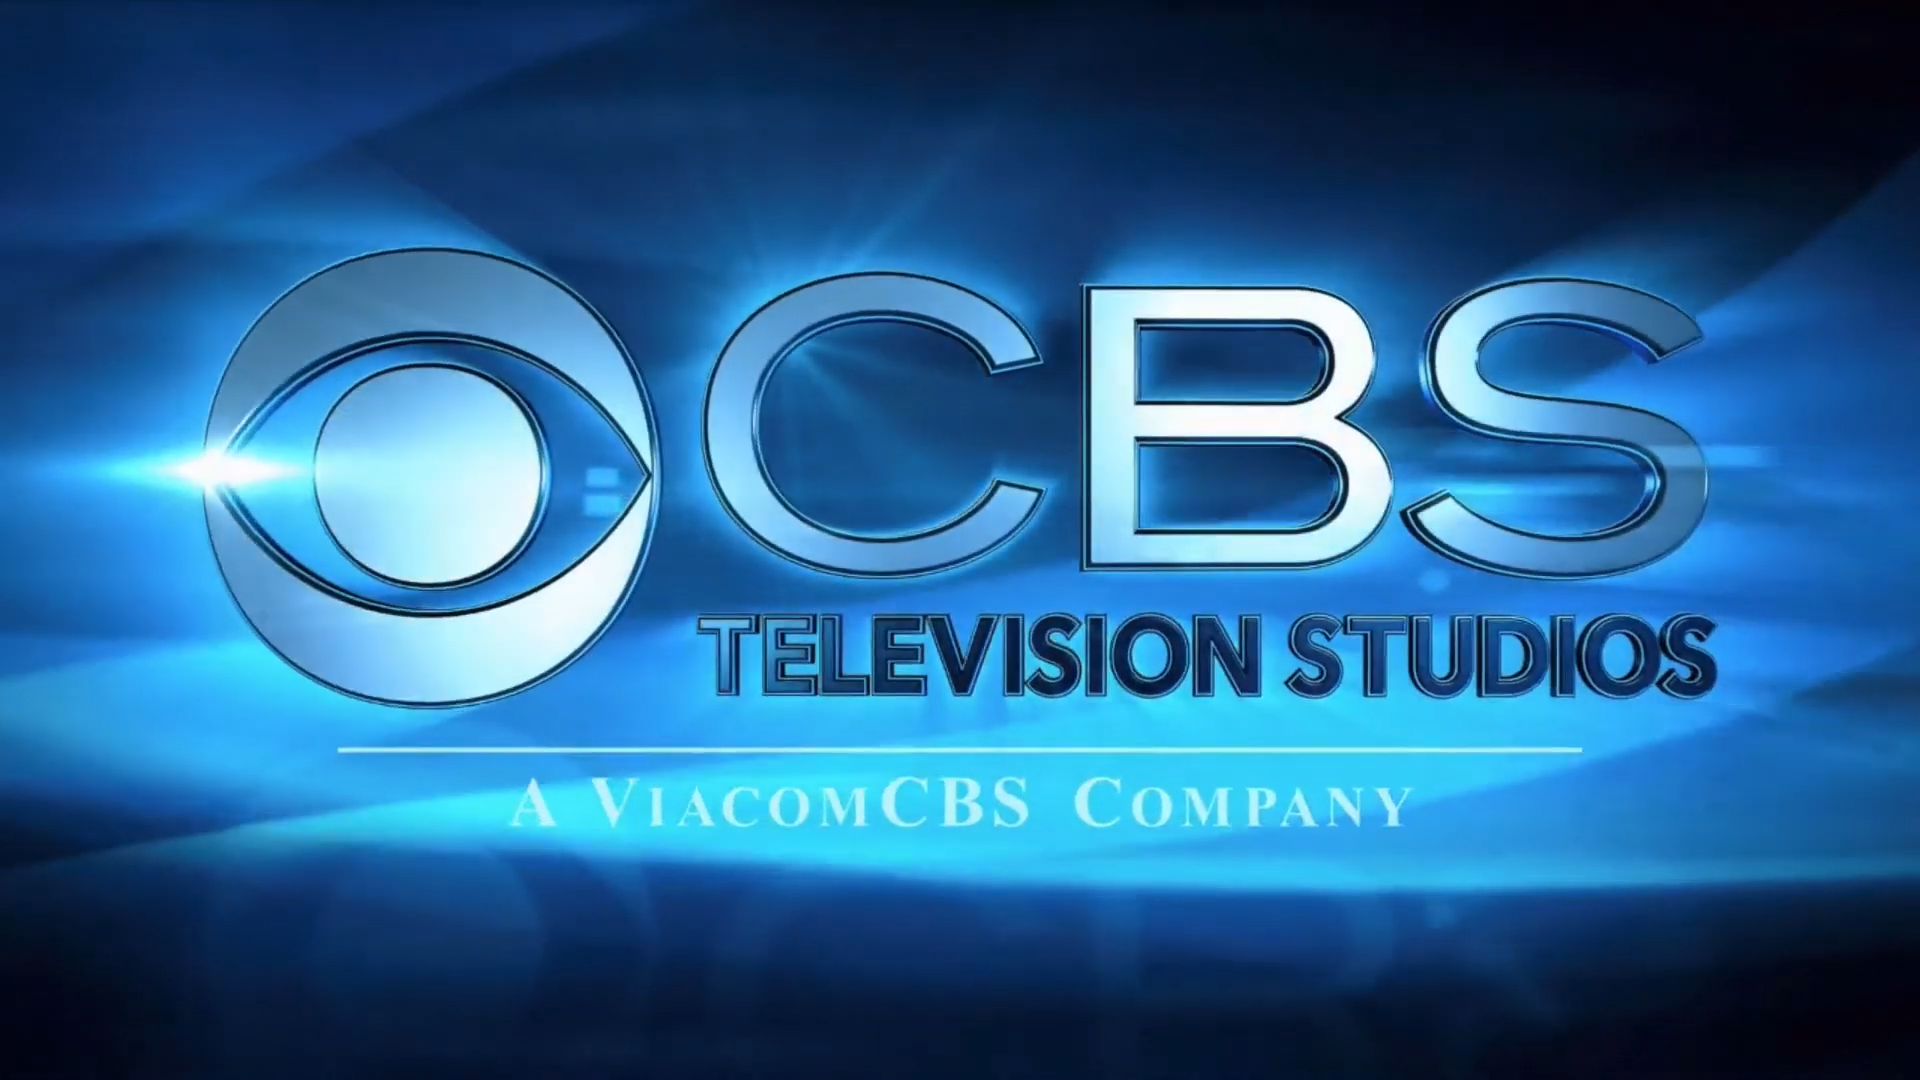 CBS Studios/On-screen Logos